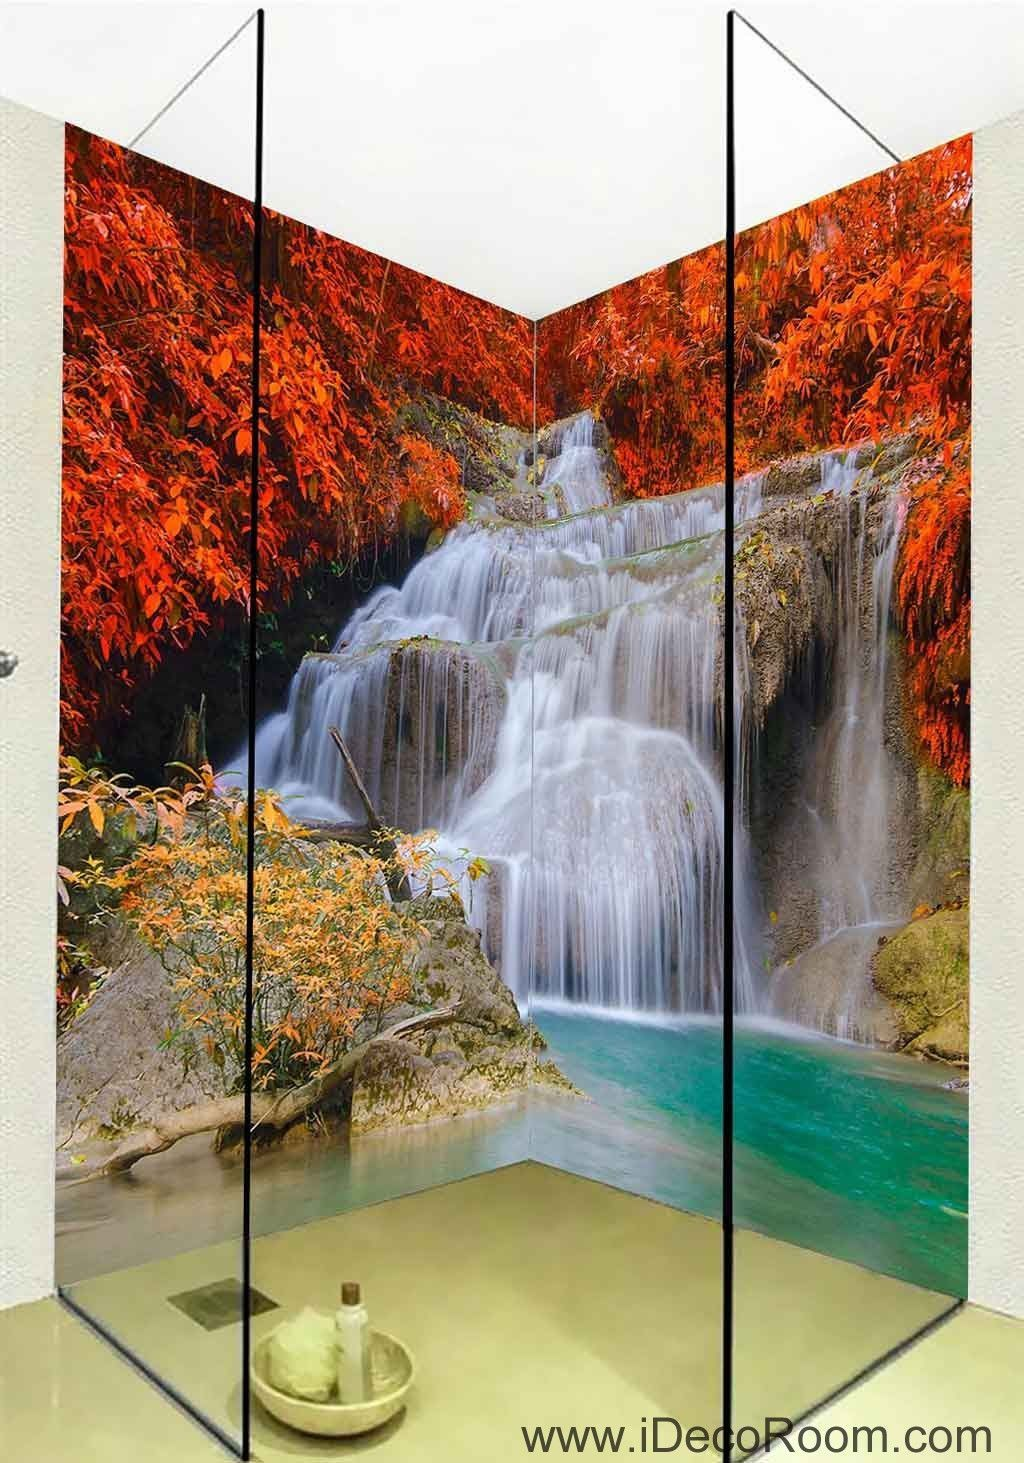 3D Wallpaper Red Leaves Waterfall Wall Murals Bathroom Decals Wall Art  Print Home Office Decor